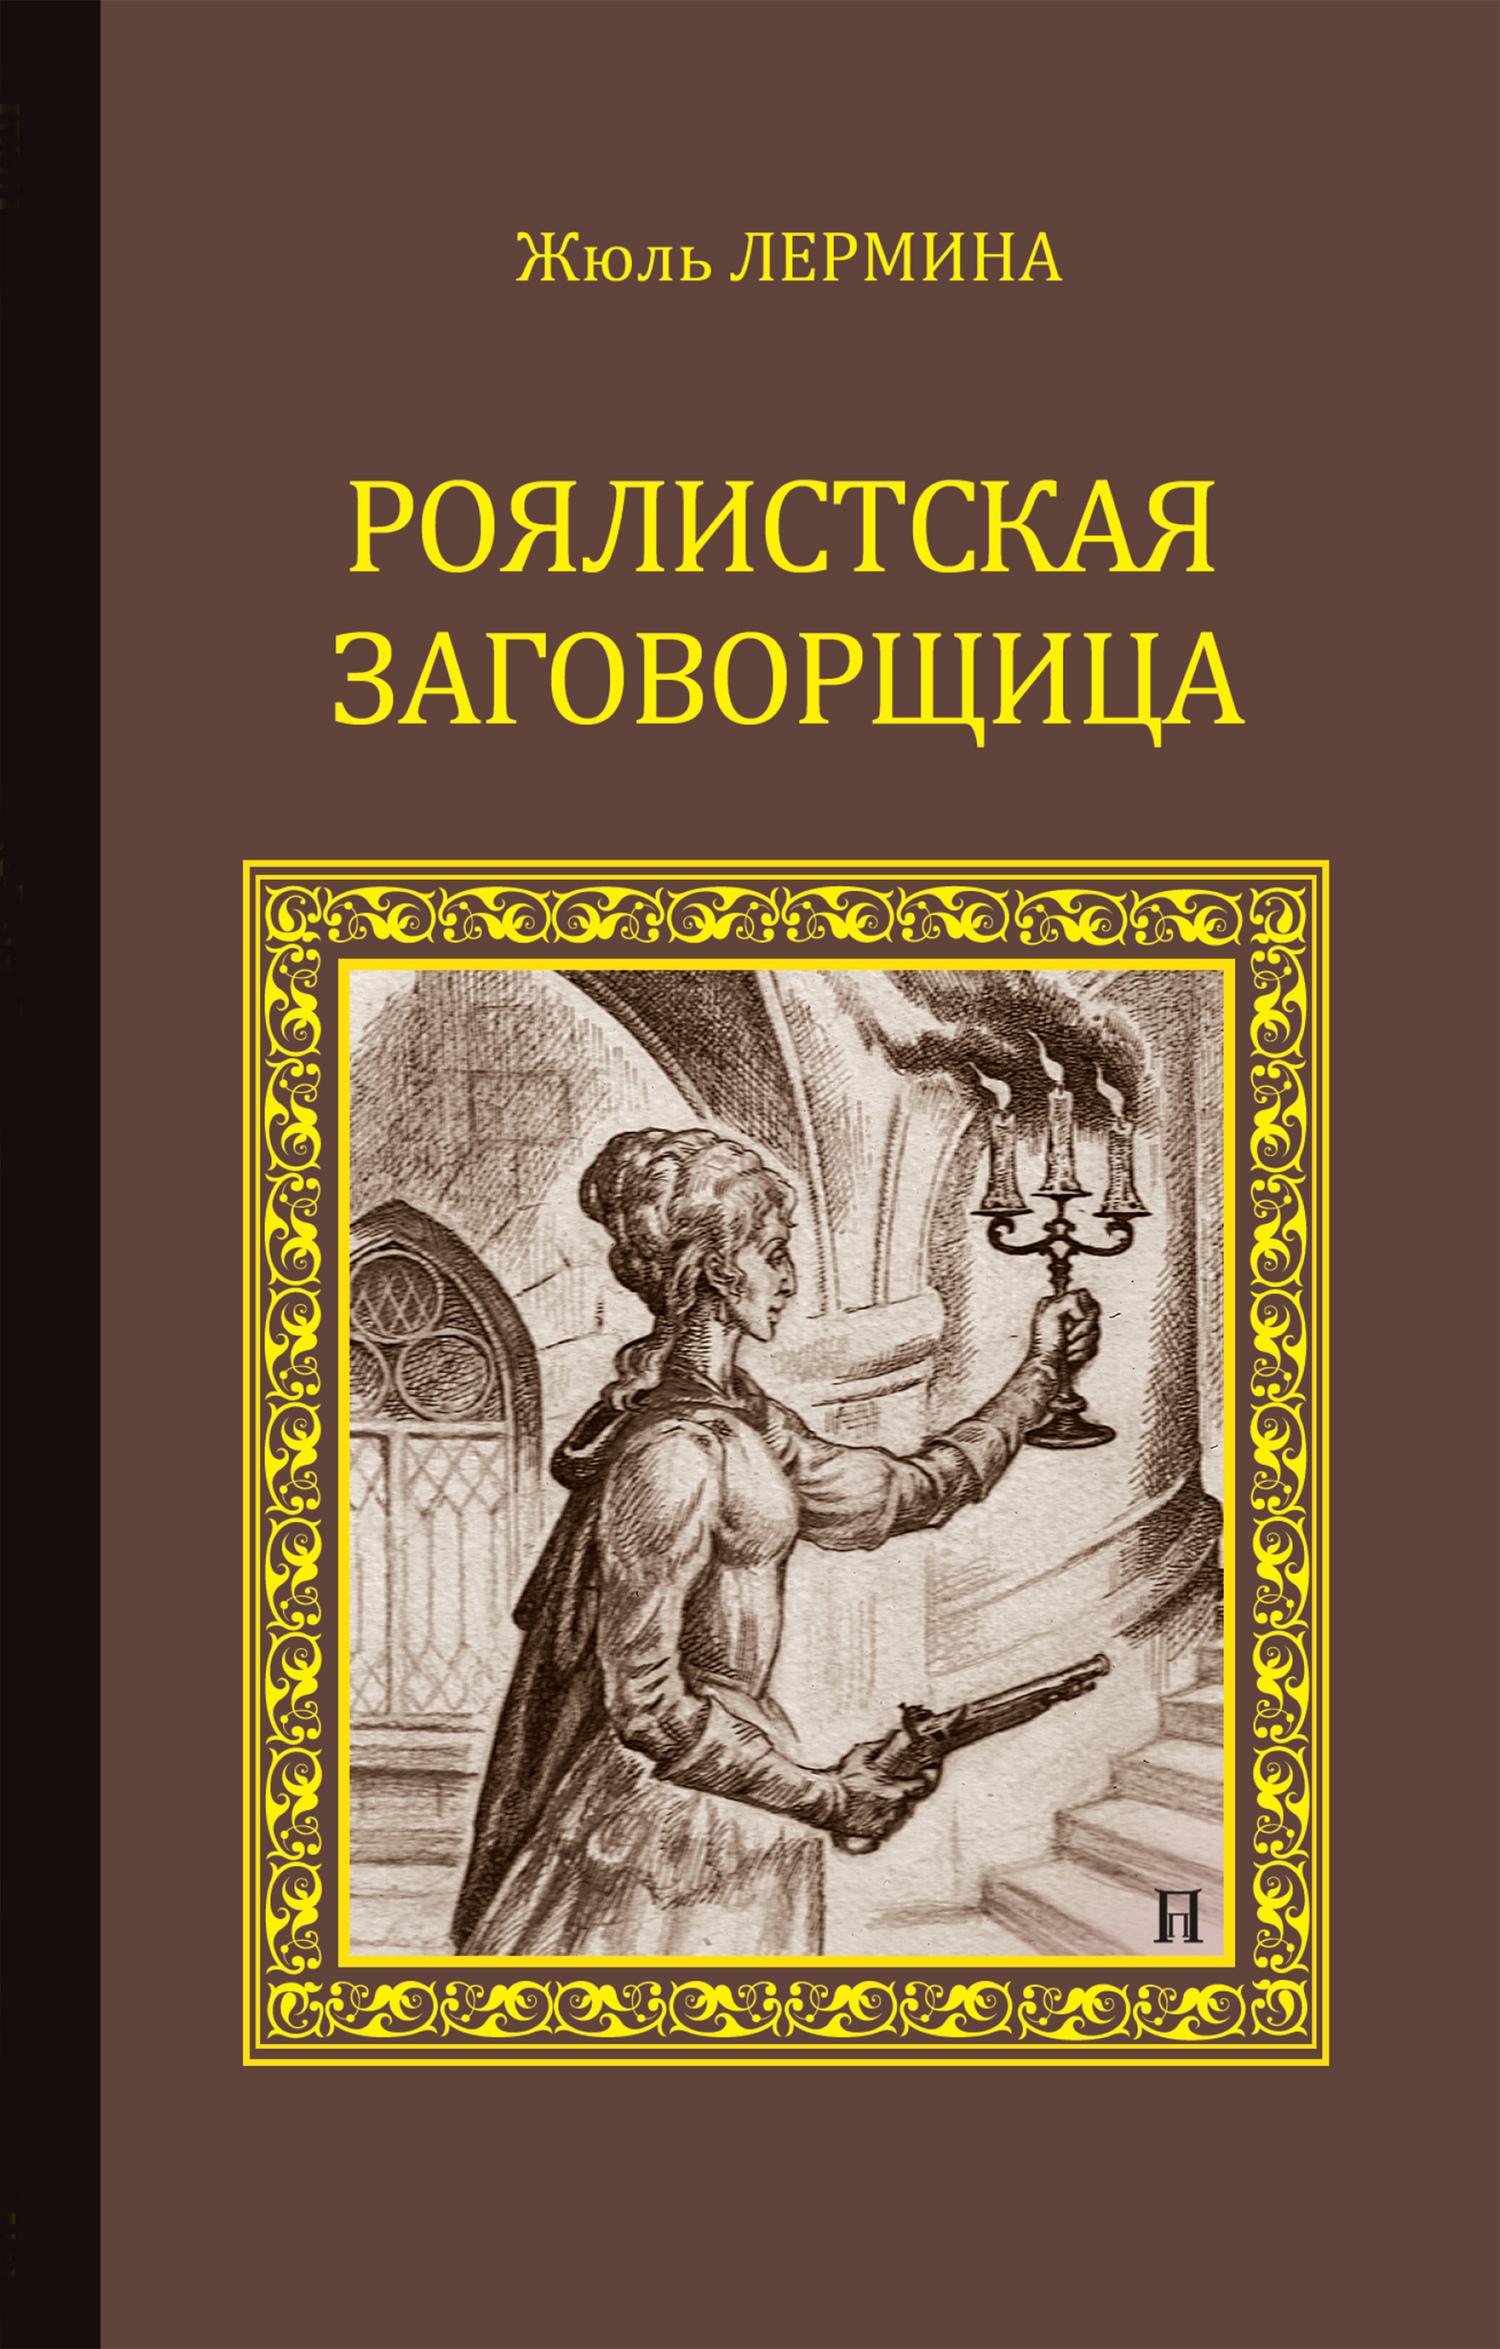 Жюль Лермина Роялистская заговорщица ISBN: 978-5-4444-9034-1 цена